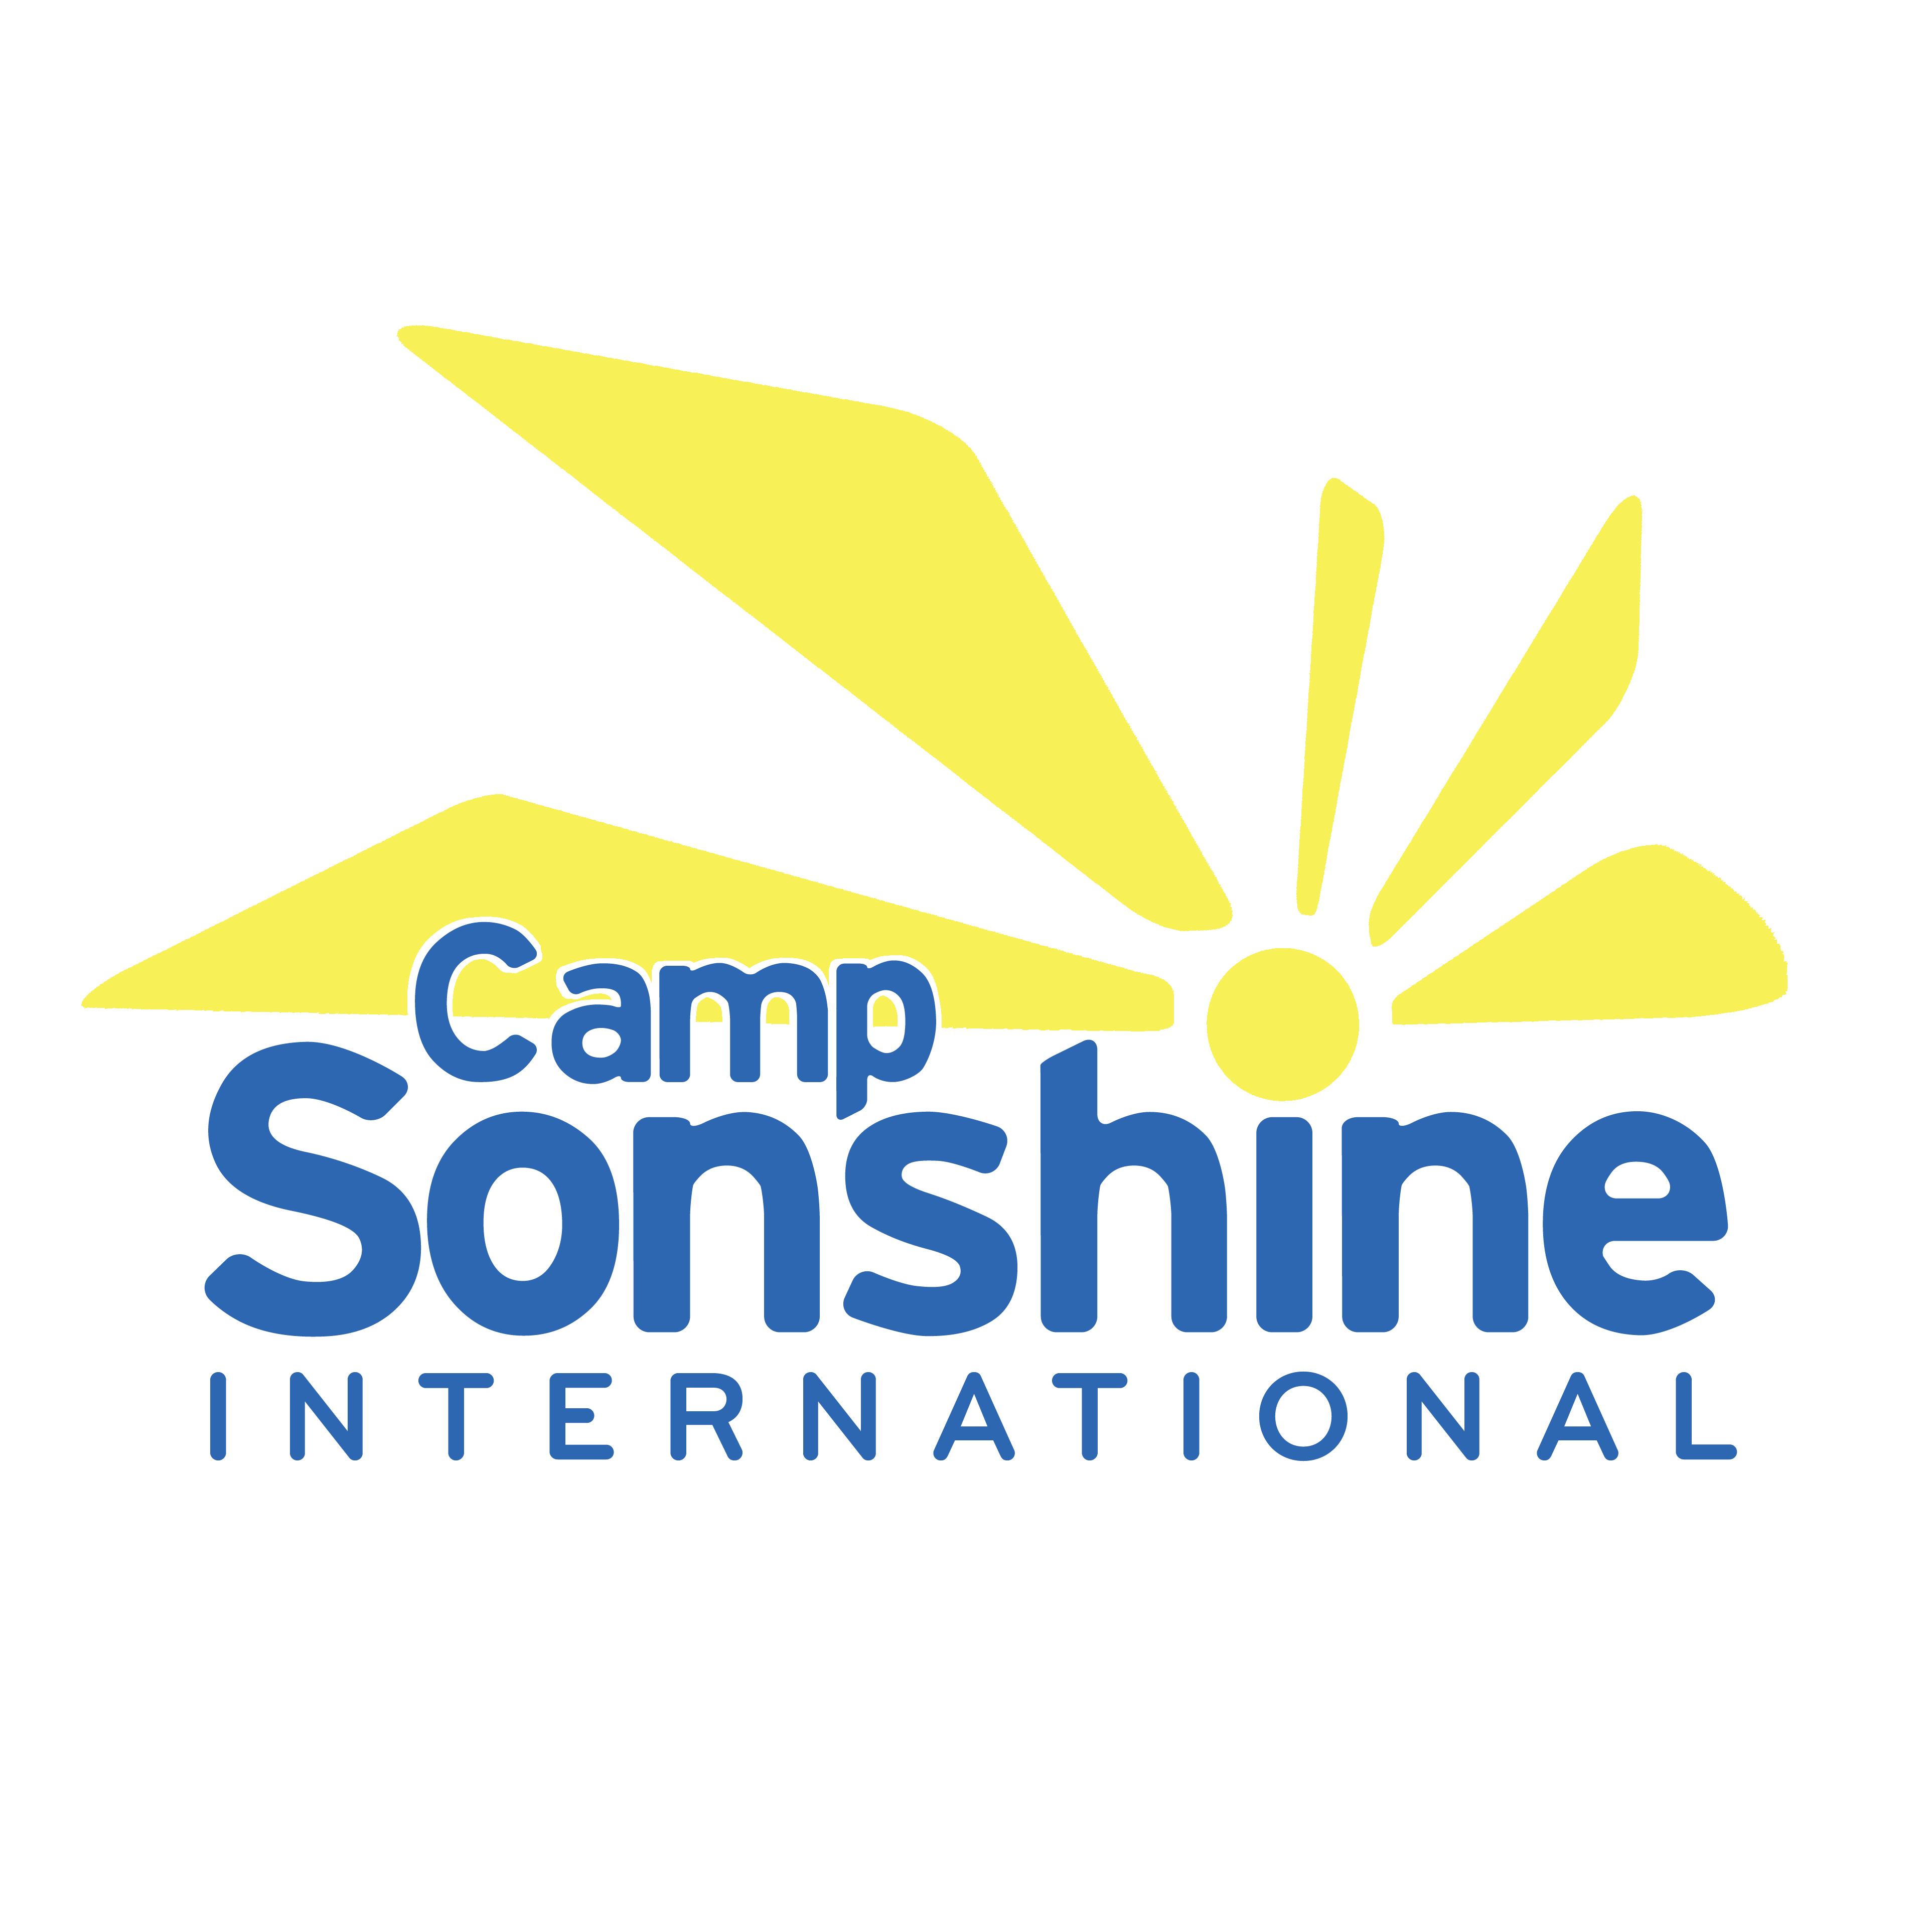 Camp Sonshine International